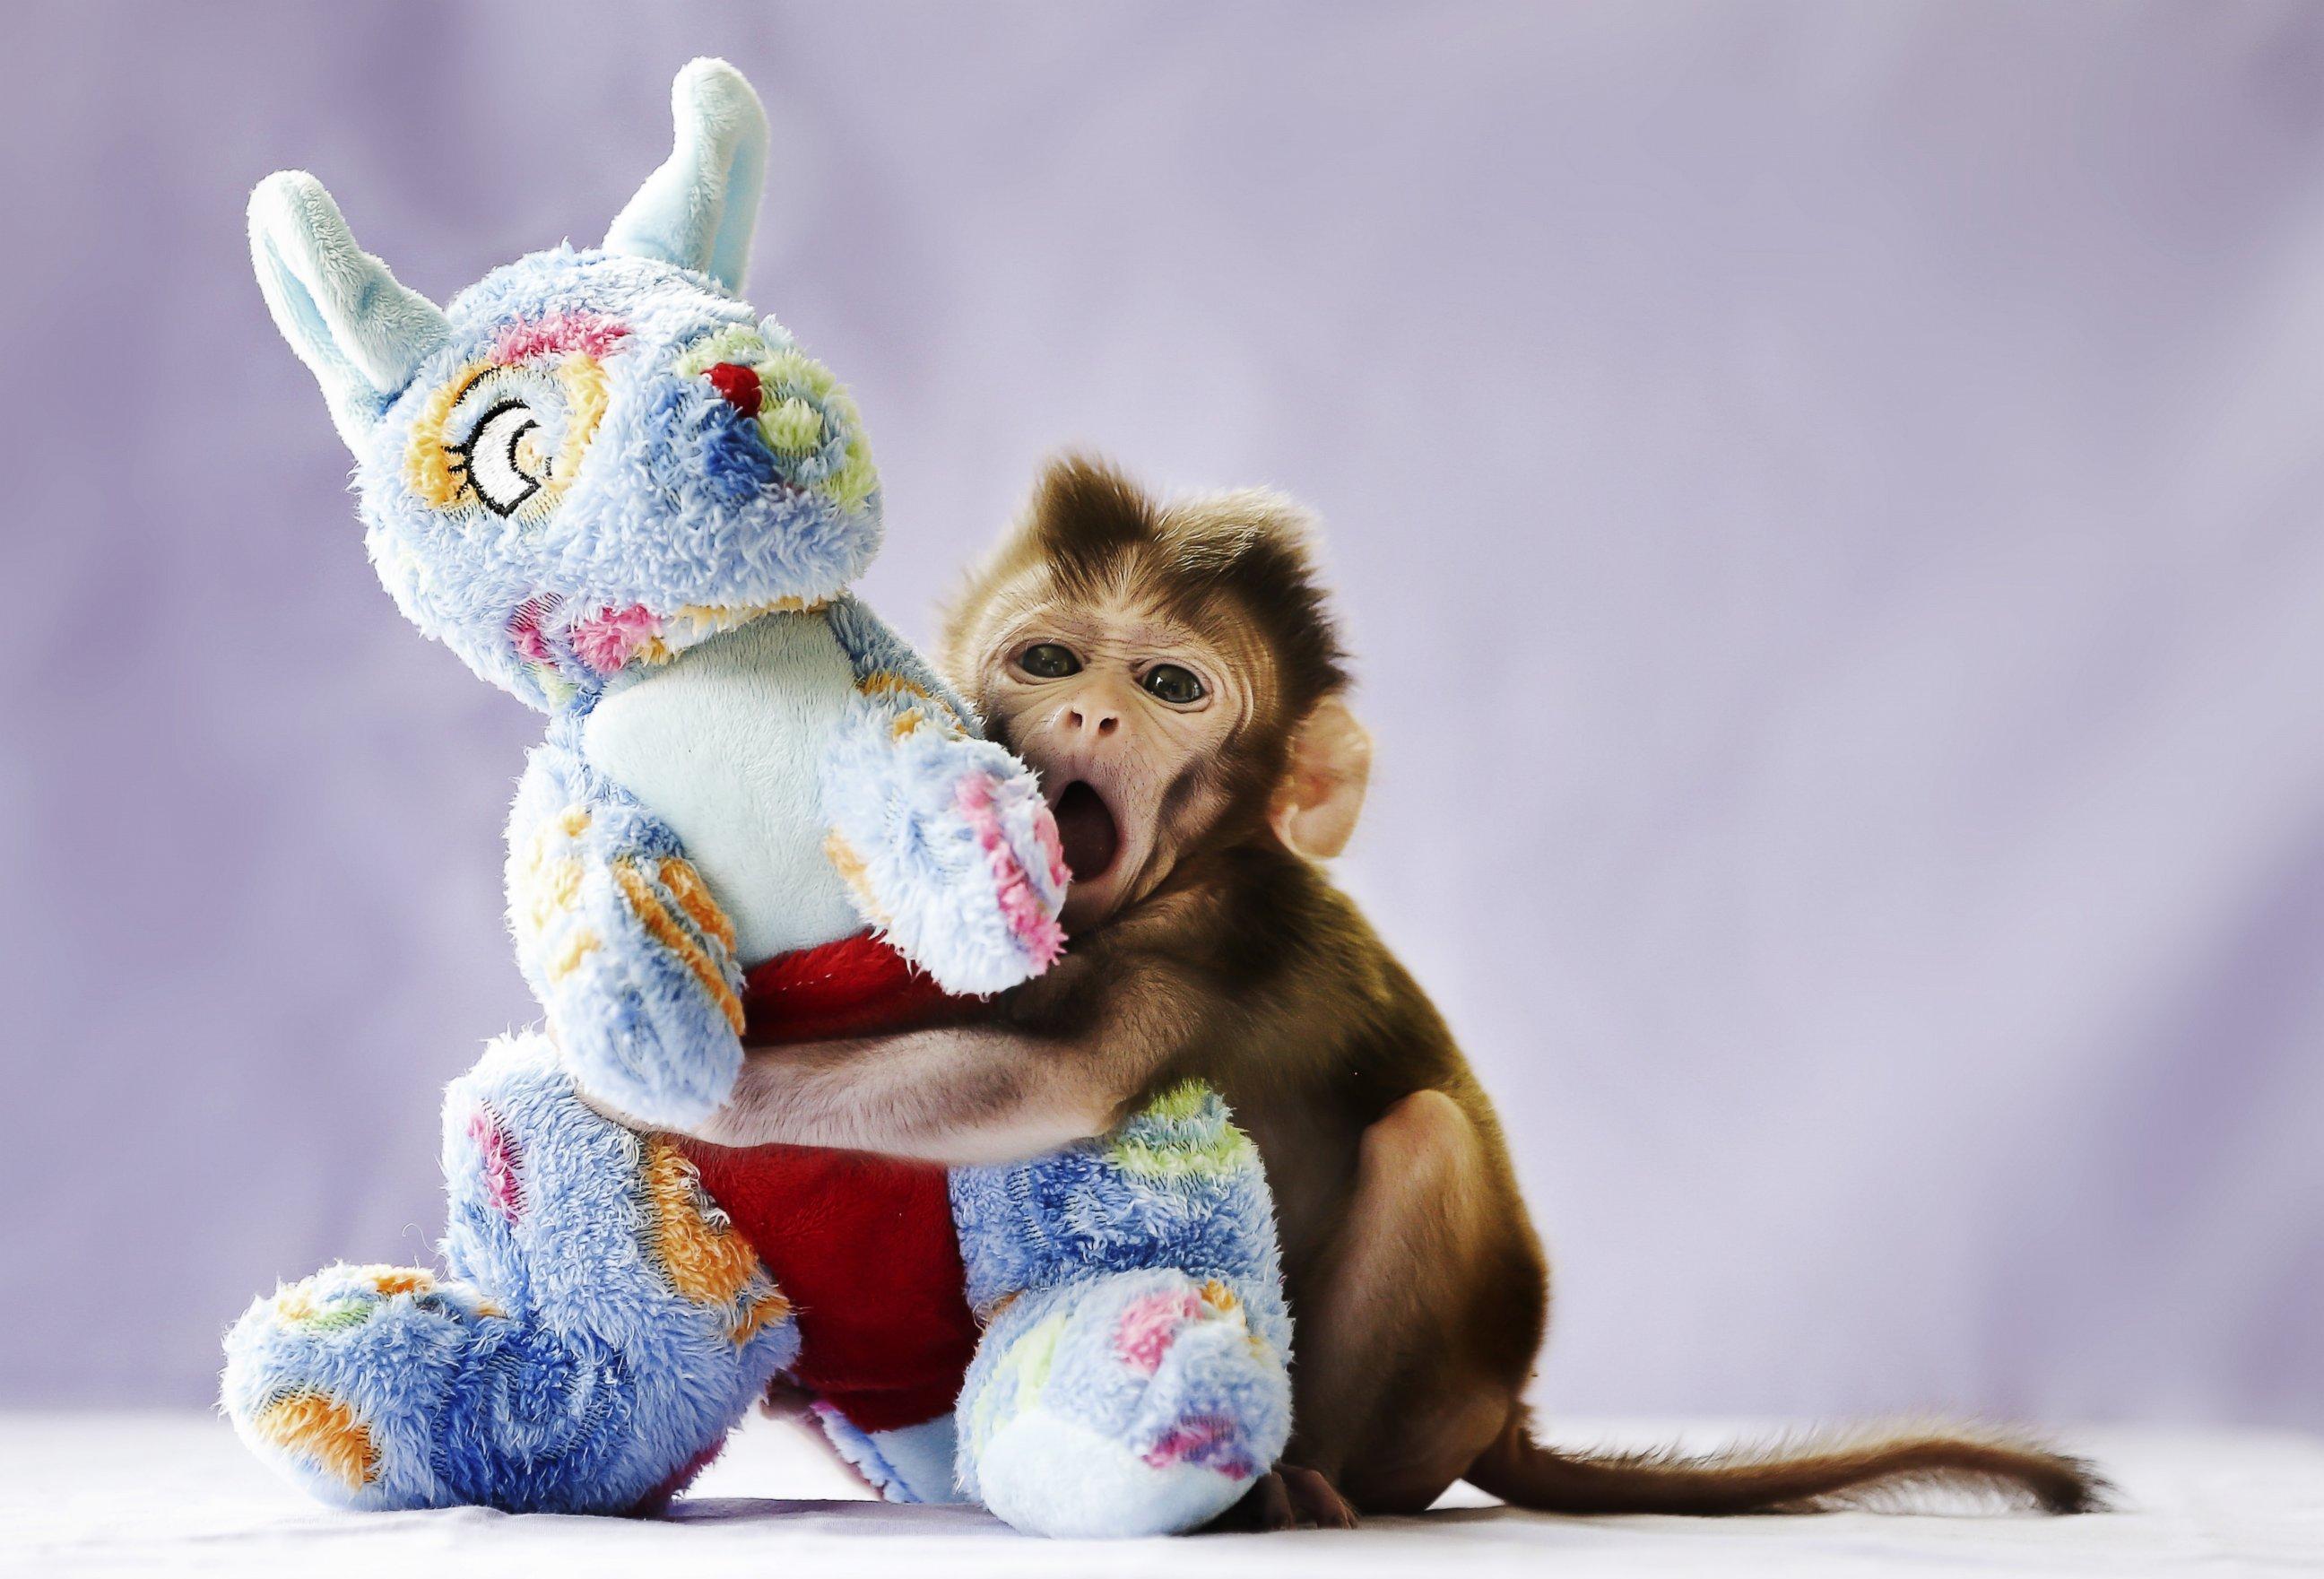 Baby Rhesus Macaque Cuddles Teddy Bear